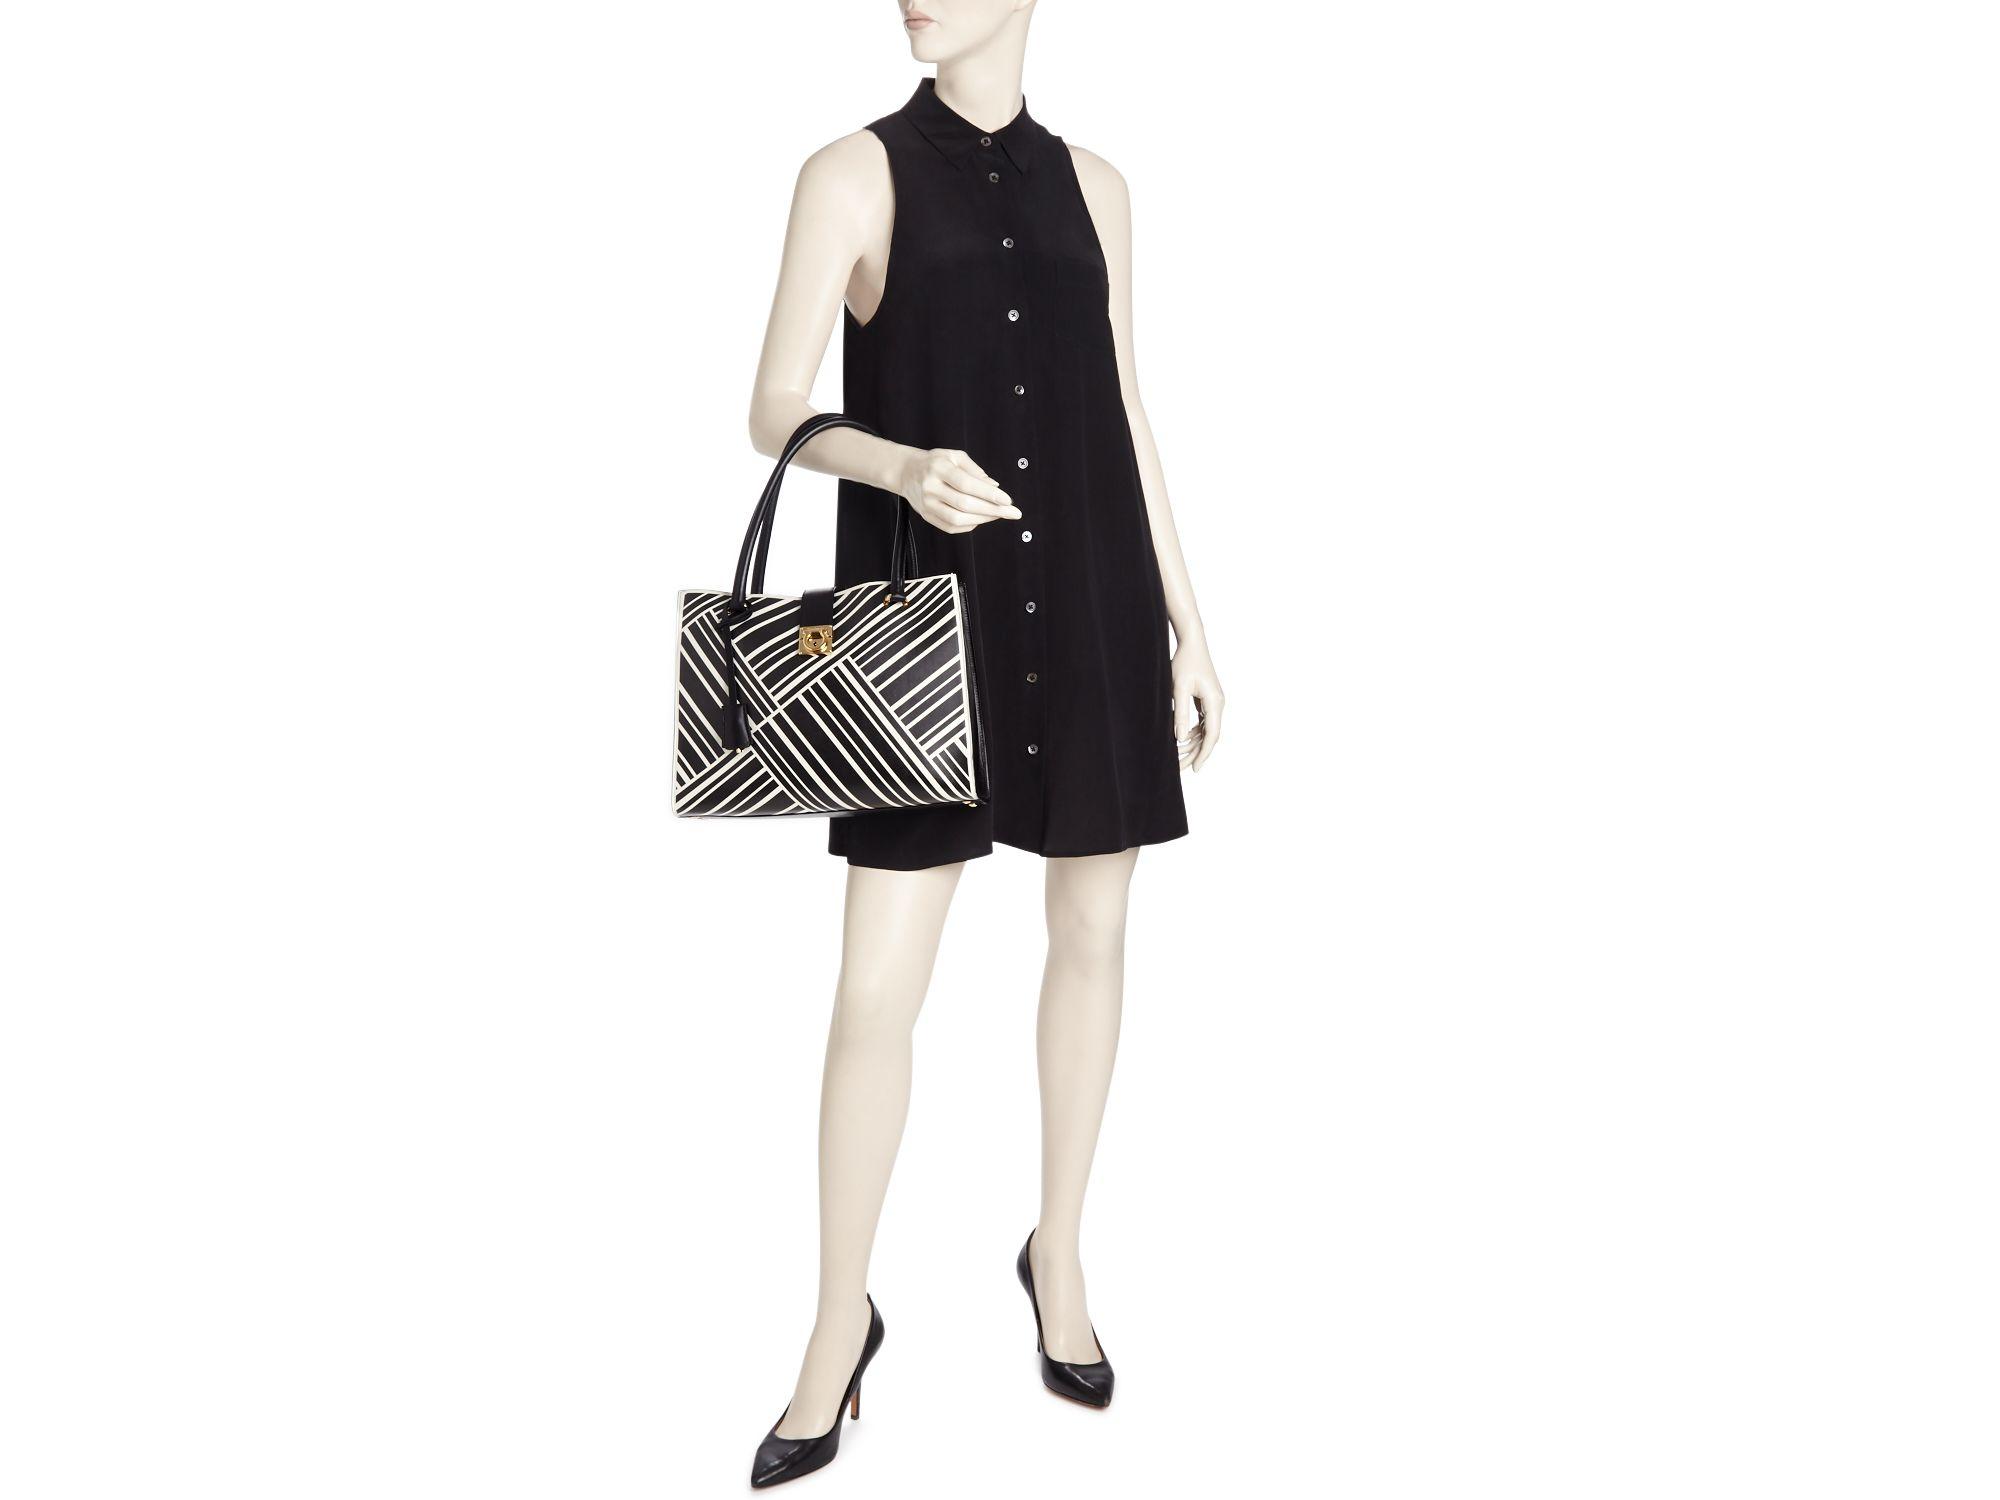 6d39ced074 Lyst - Ferragamo Marlene Tote - 100% Bloomingdale s Exclusive in Black